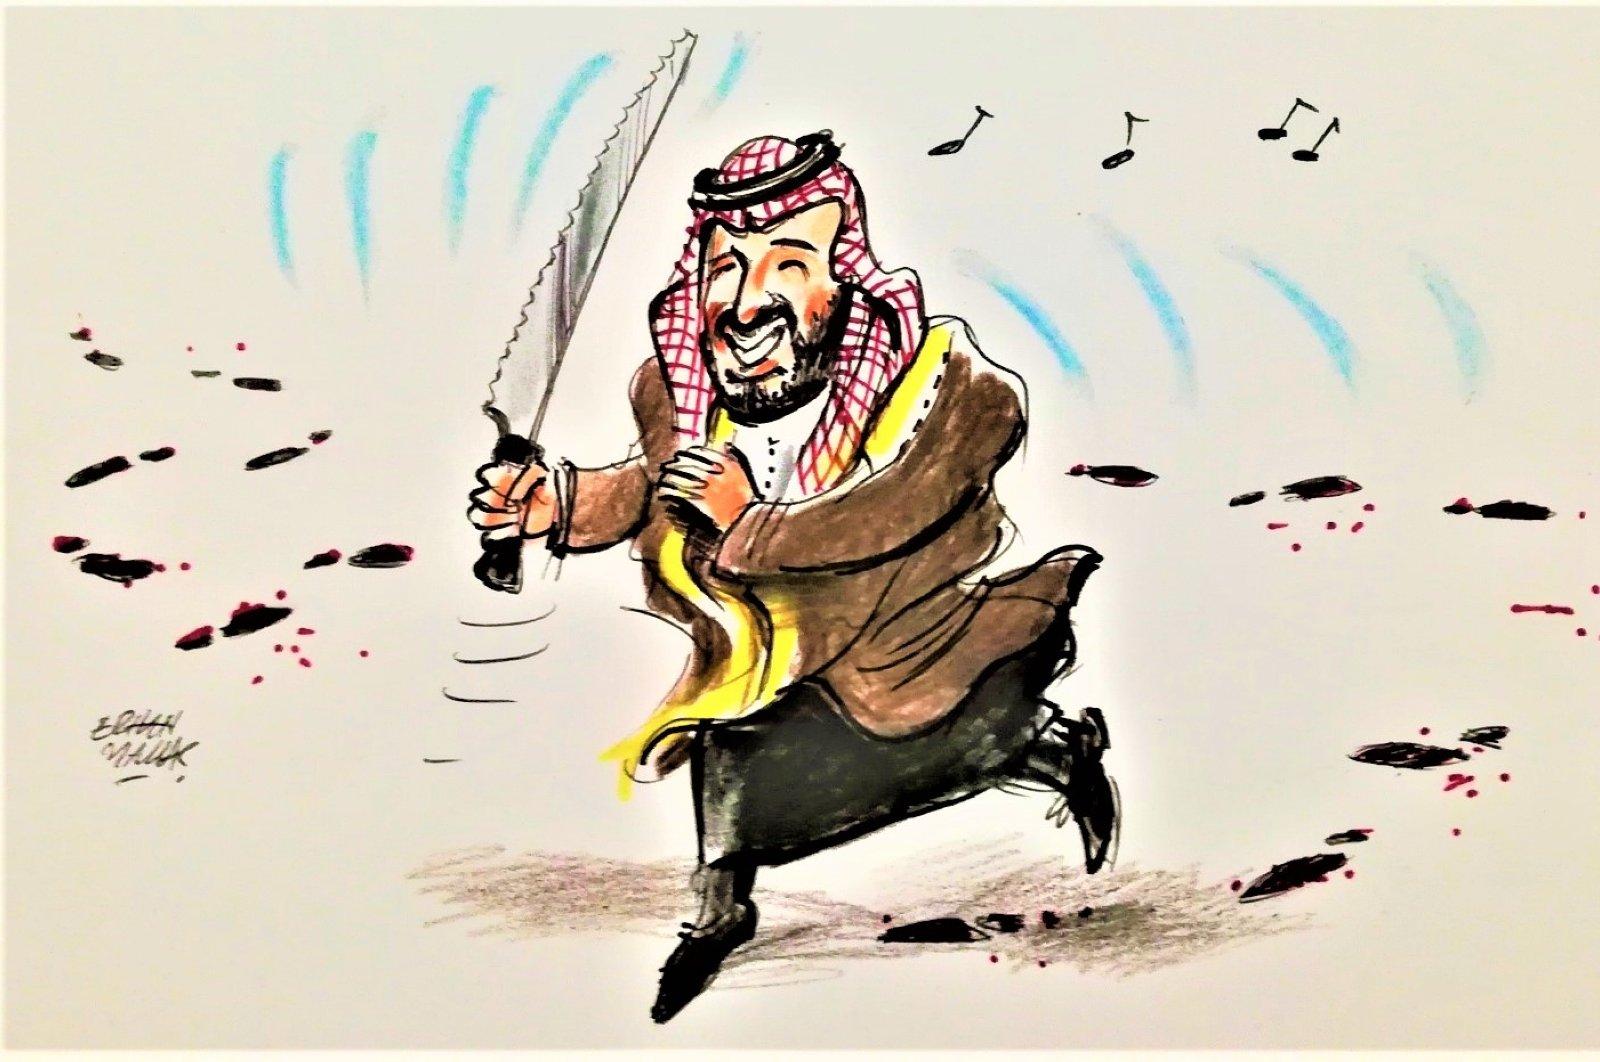 An Illustration featuring Saudi Crown Prince Mohammed bin Salman (MBS) by Erhan Yalvaç.